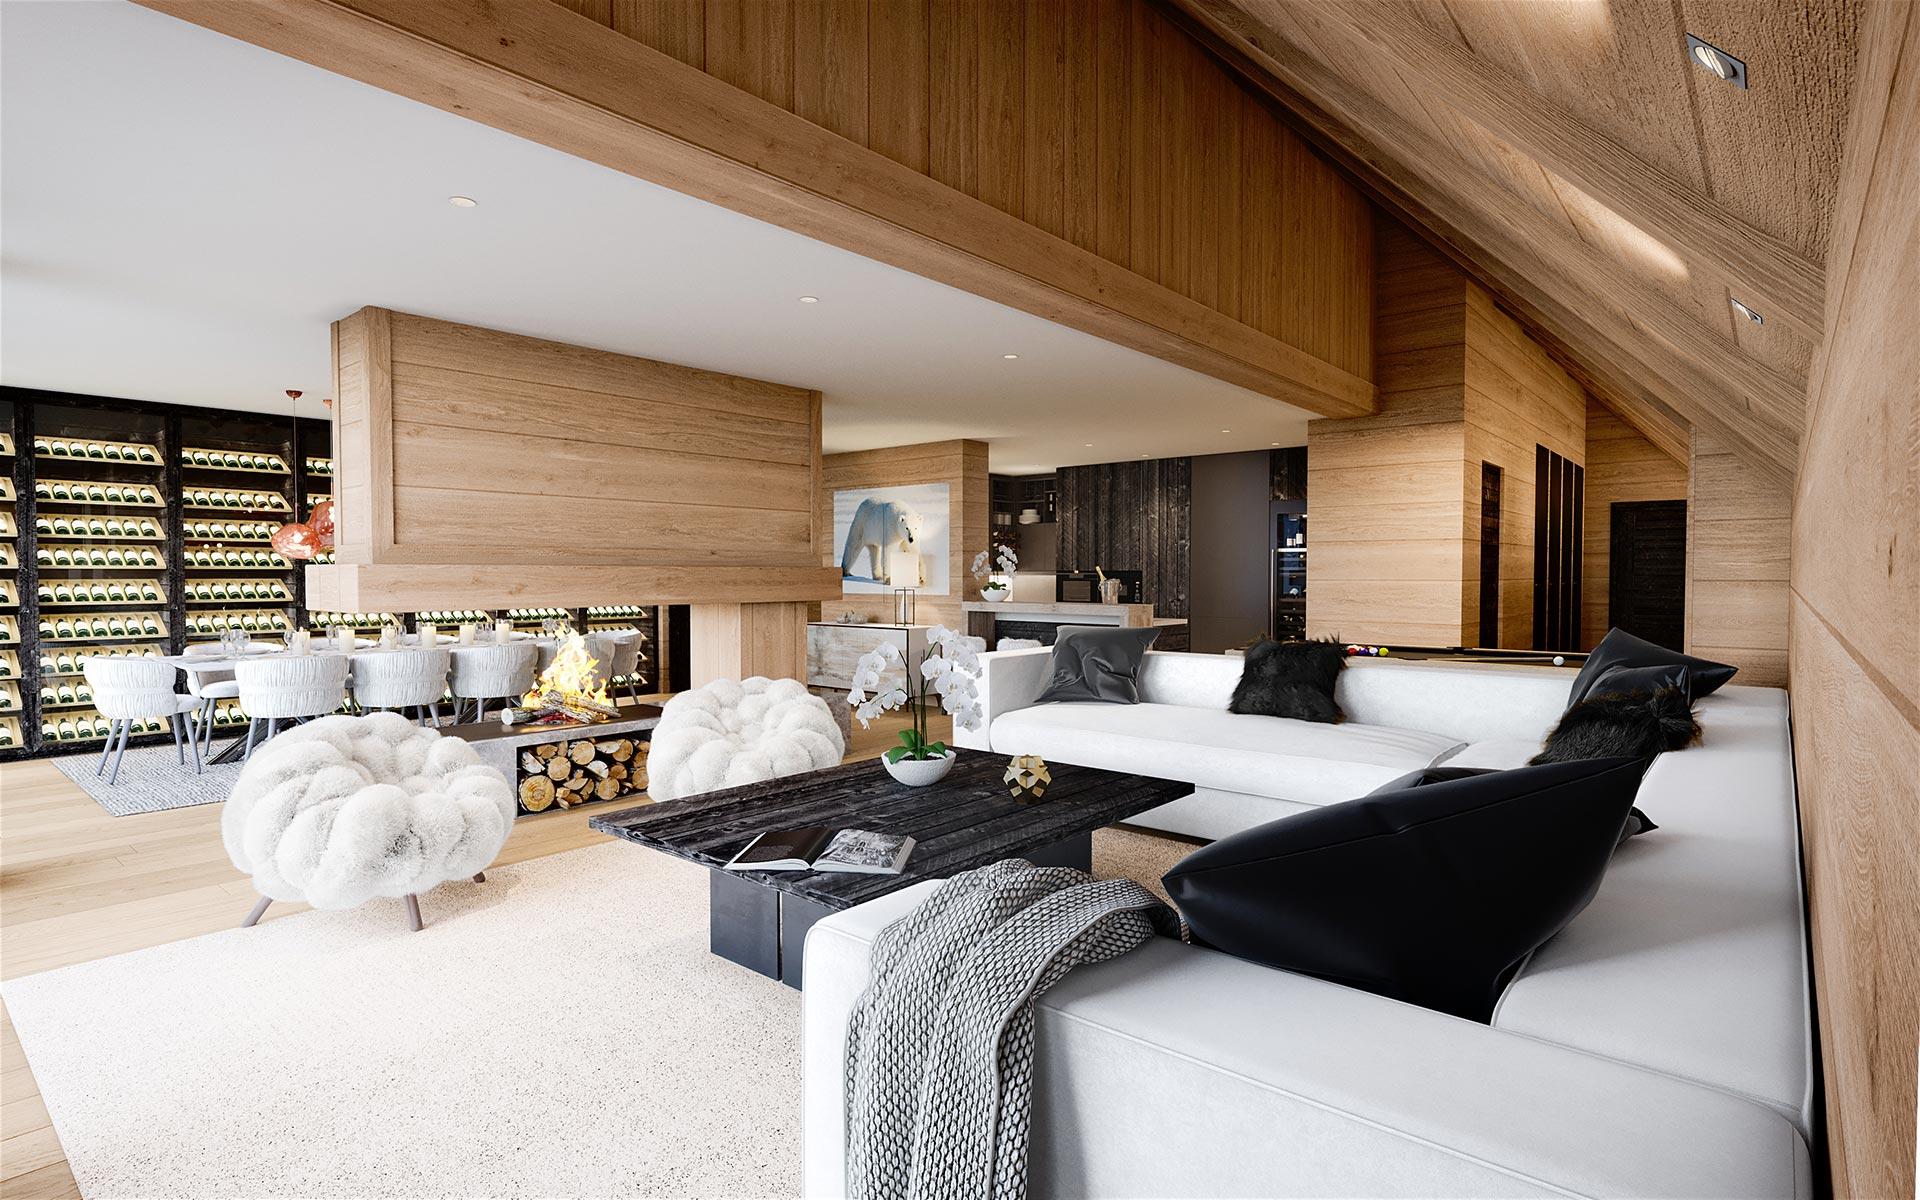 3D Render of a luxurious chalet interior